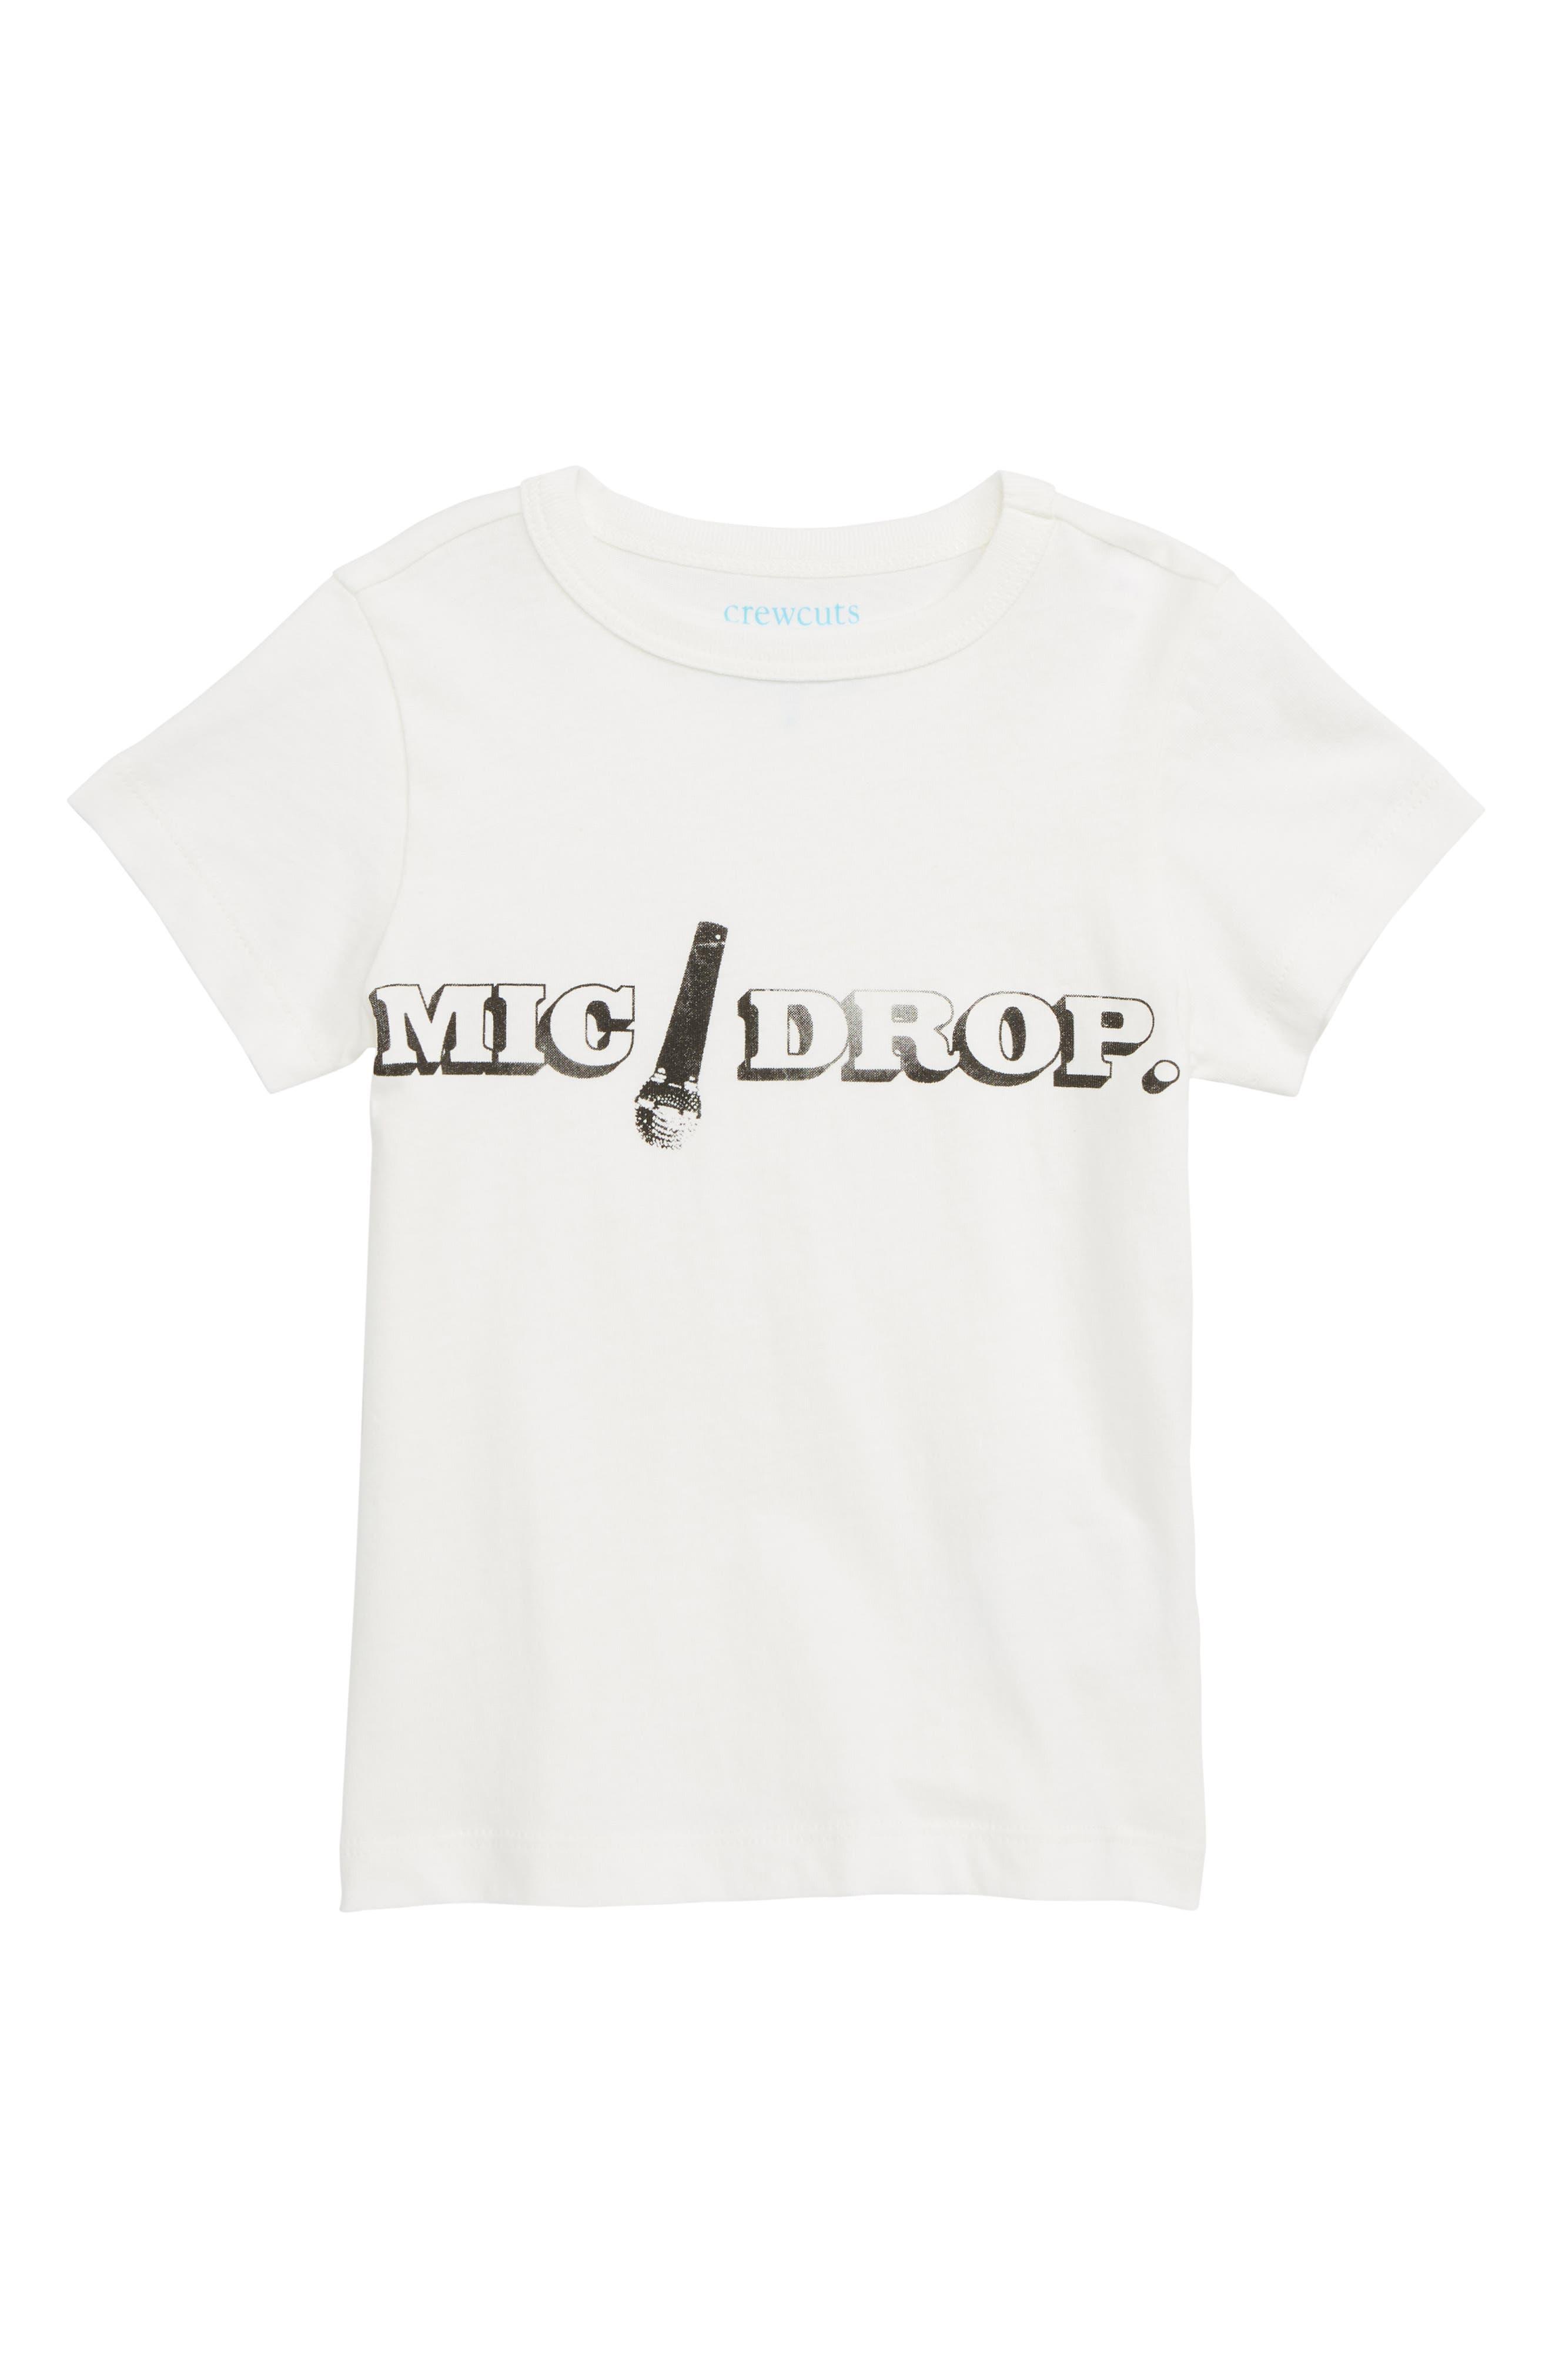 Mic Drop T-Shirt,                             Main thumbnail 1, color,                             IVORY